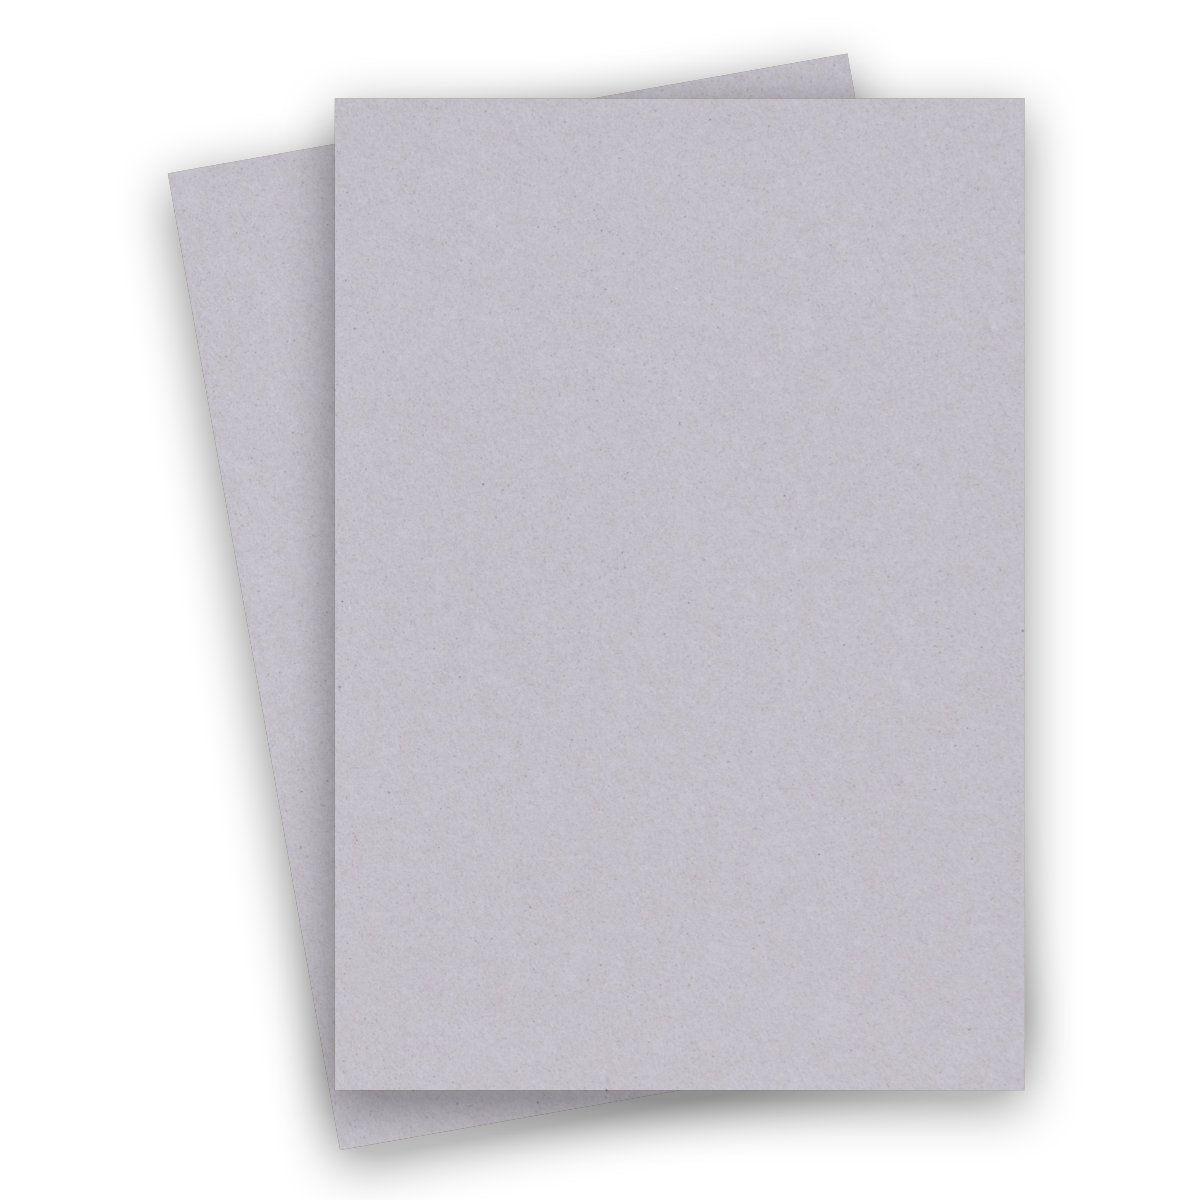 Crush White Grape 8 5x14 Legal Size Paper 81lb Text 120gsm 400 Pk In 2021 Legal Size Paper Cardstock Paper Paper